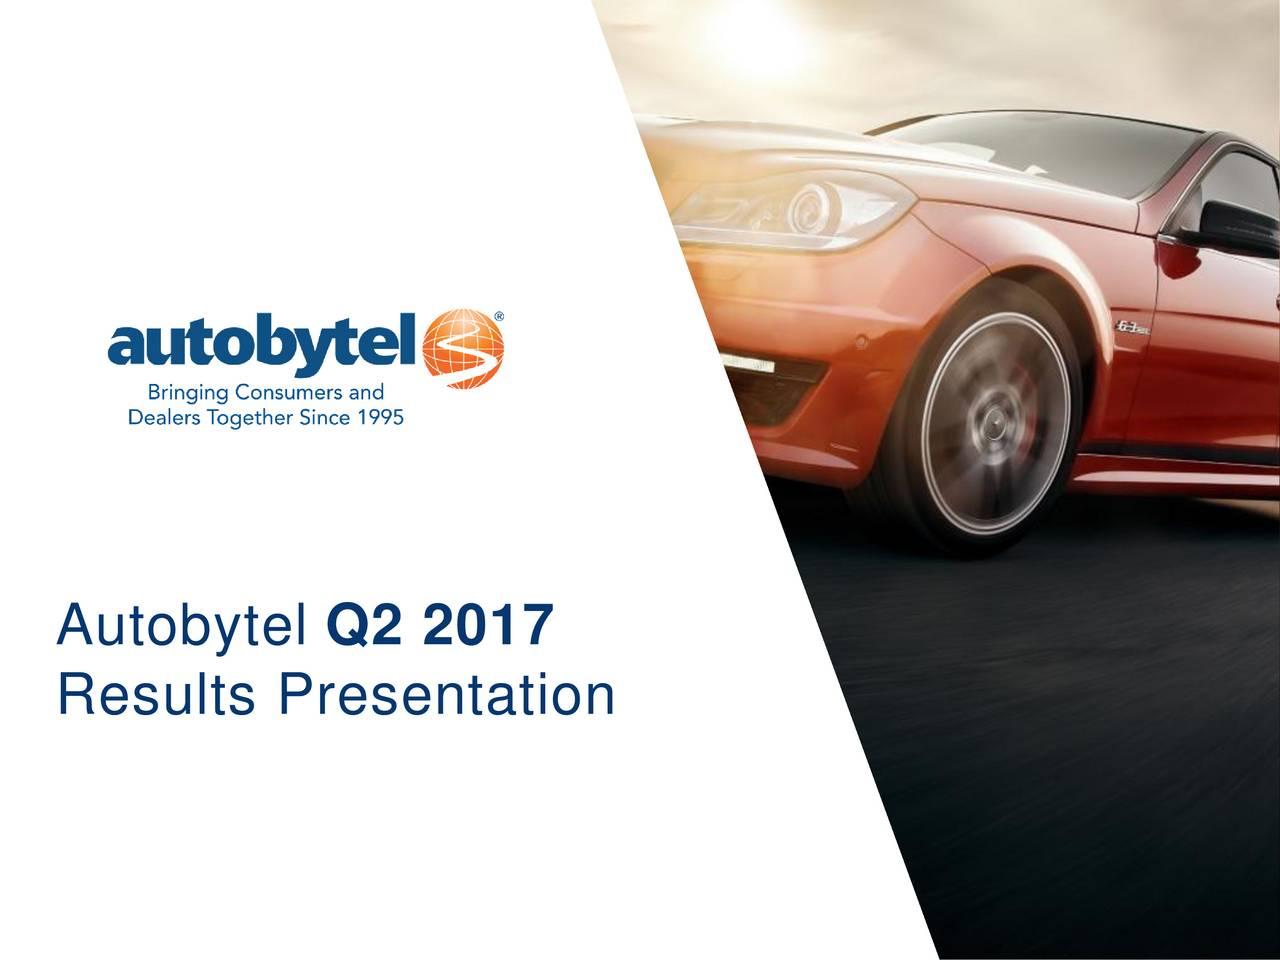 Autobytel Q2 2017 Results Presentation